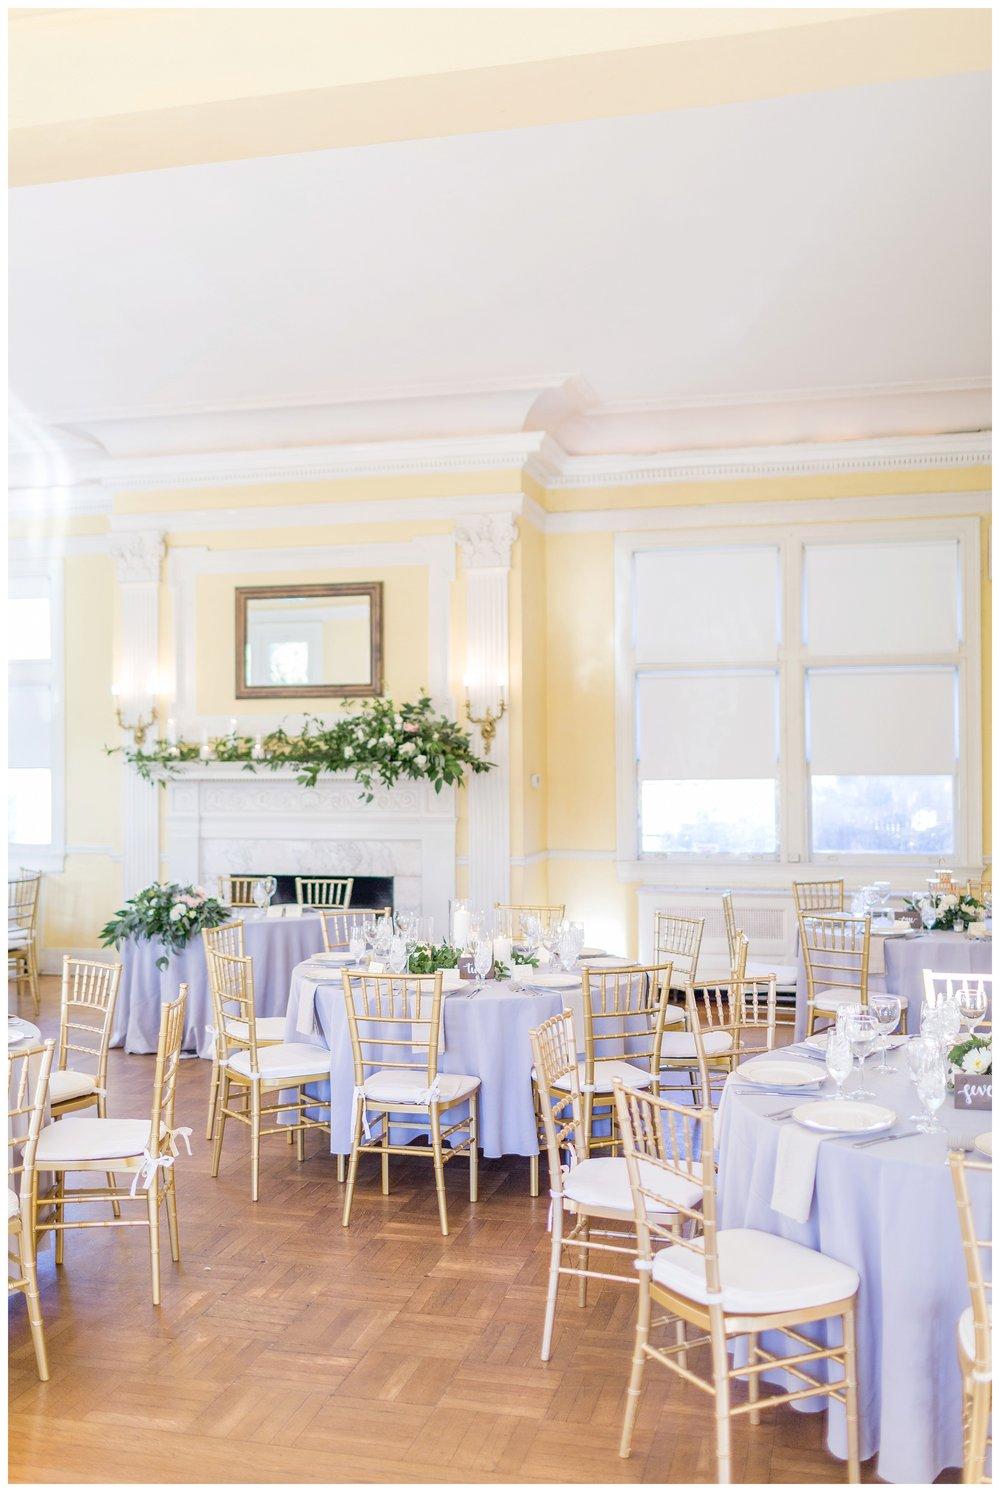 Meridian Hill Park Wedding | Washington DC Wedding Photographer Kir Tuben_0094.jpg